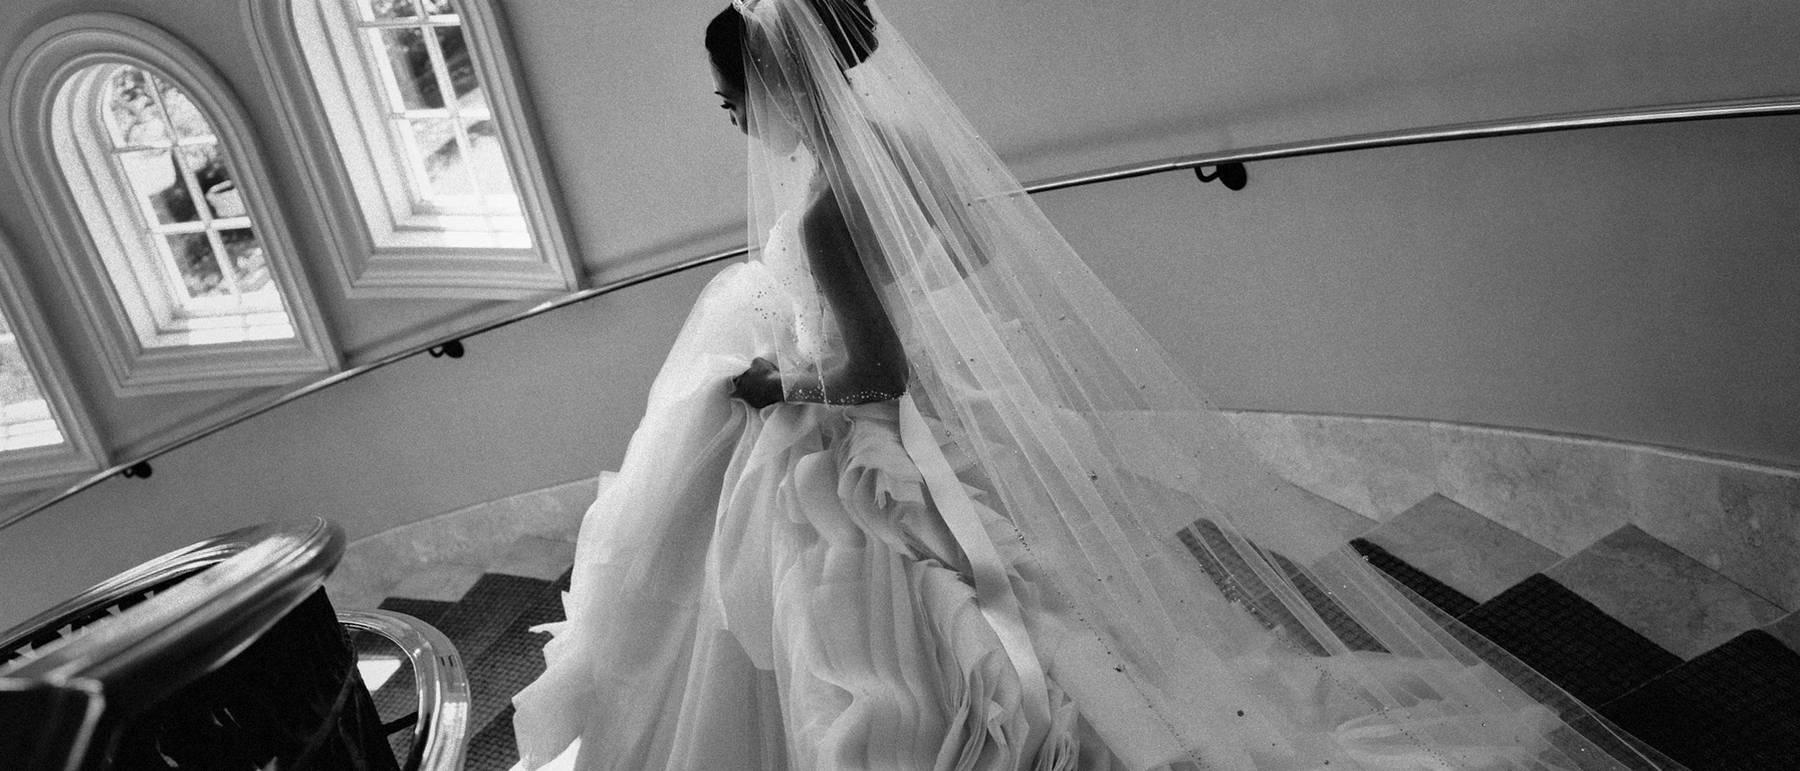 johnandjoseph-wedding-photographer-hz-slider-206